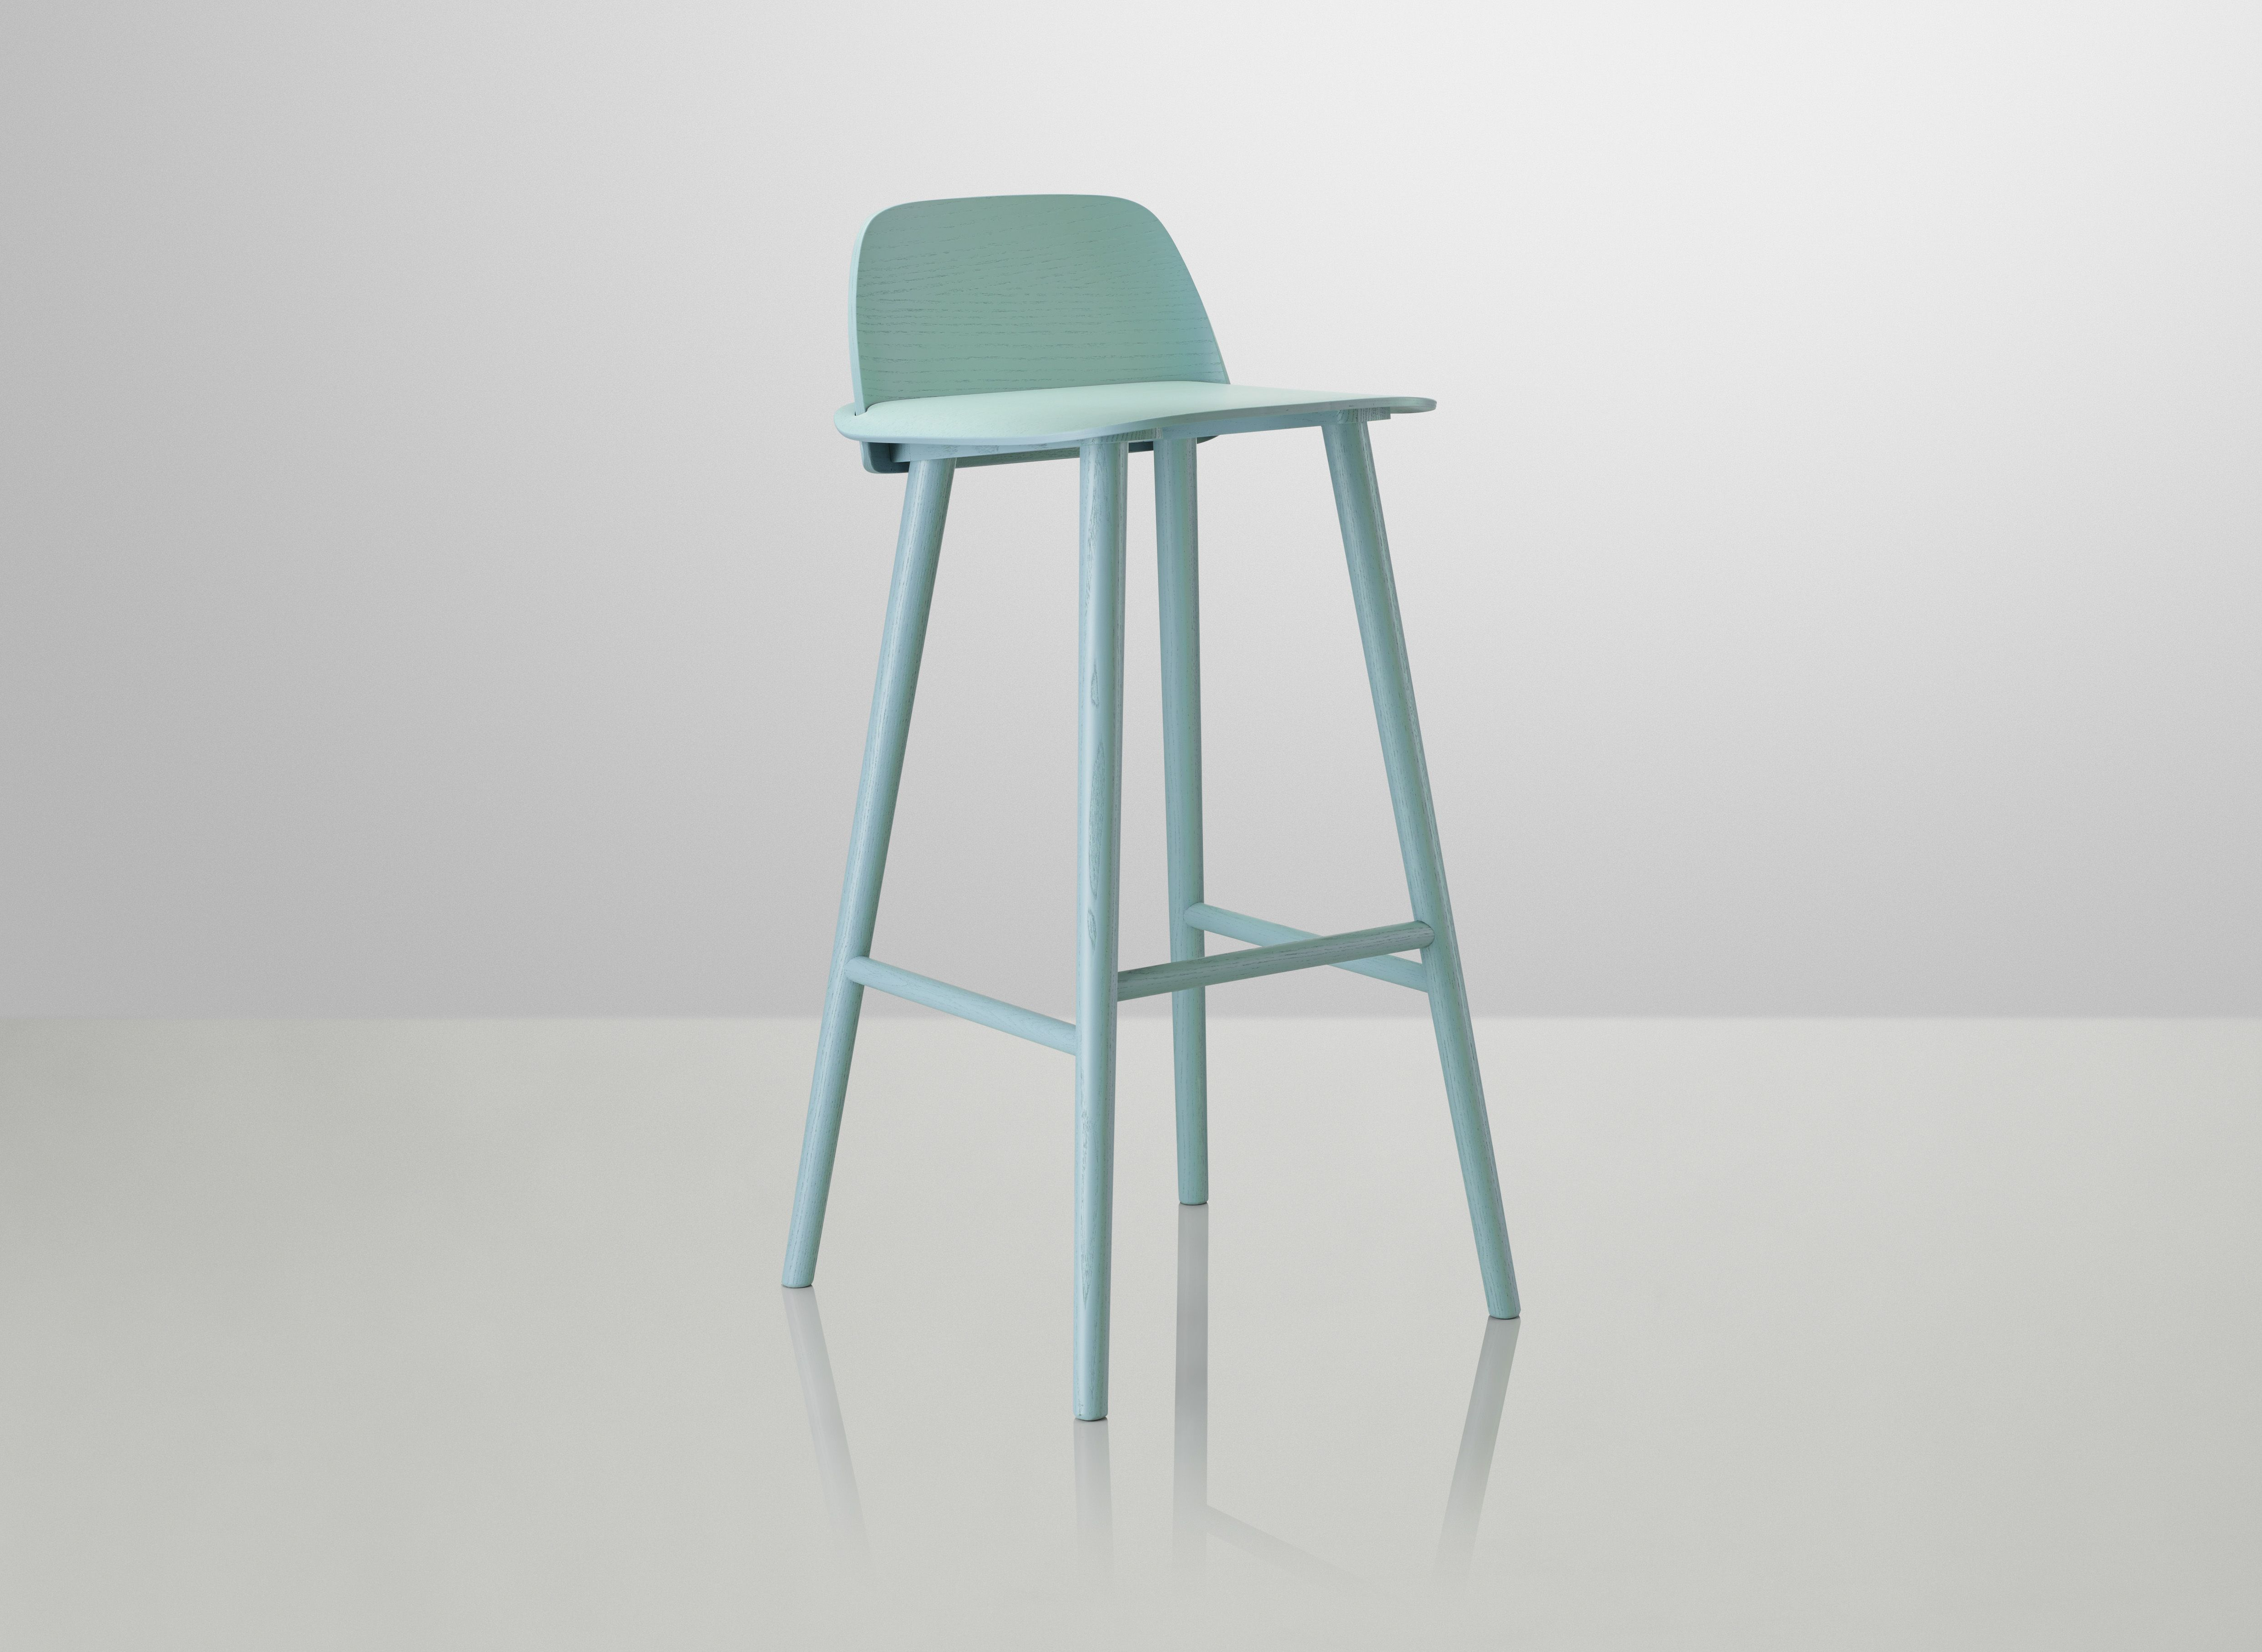 Nerd Barkruk Muuto : Nerd bar stool design by david geckeler muuto